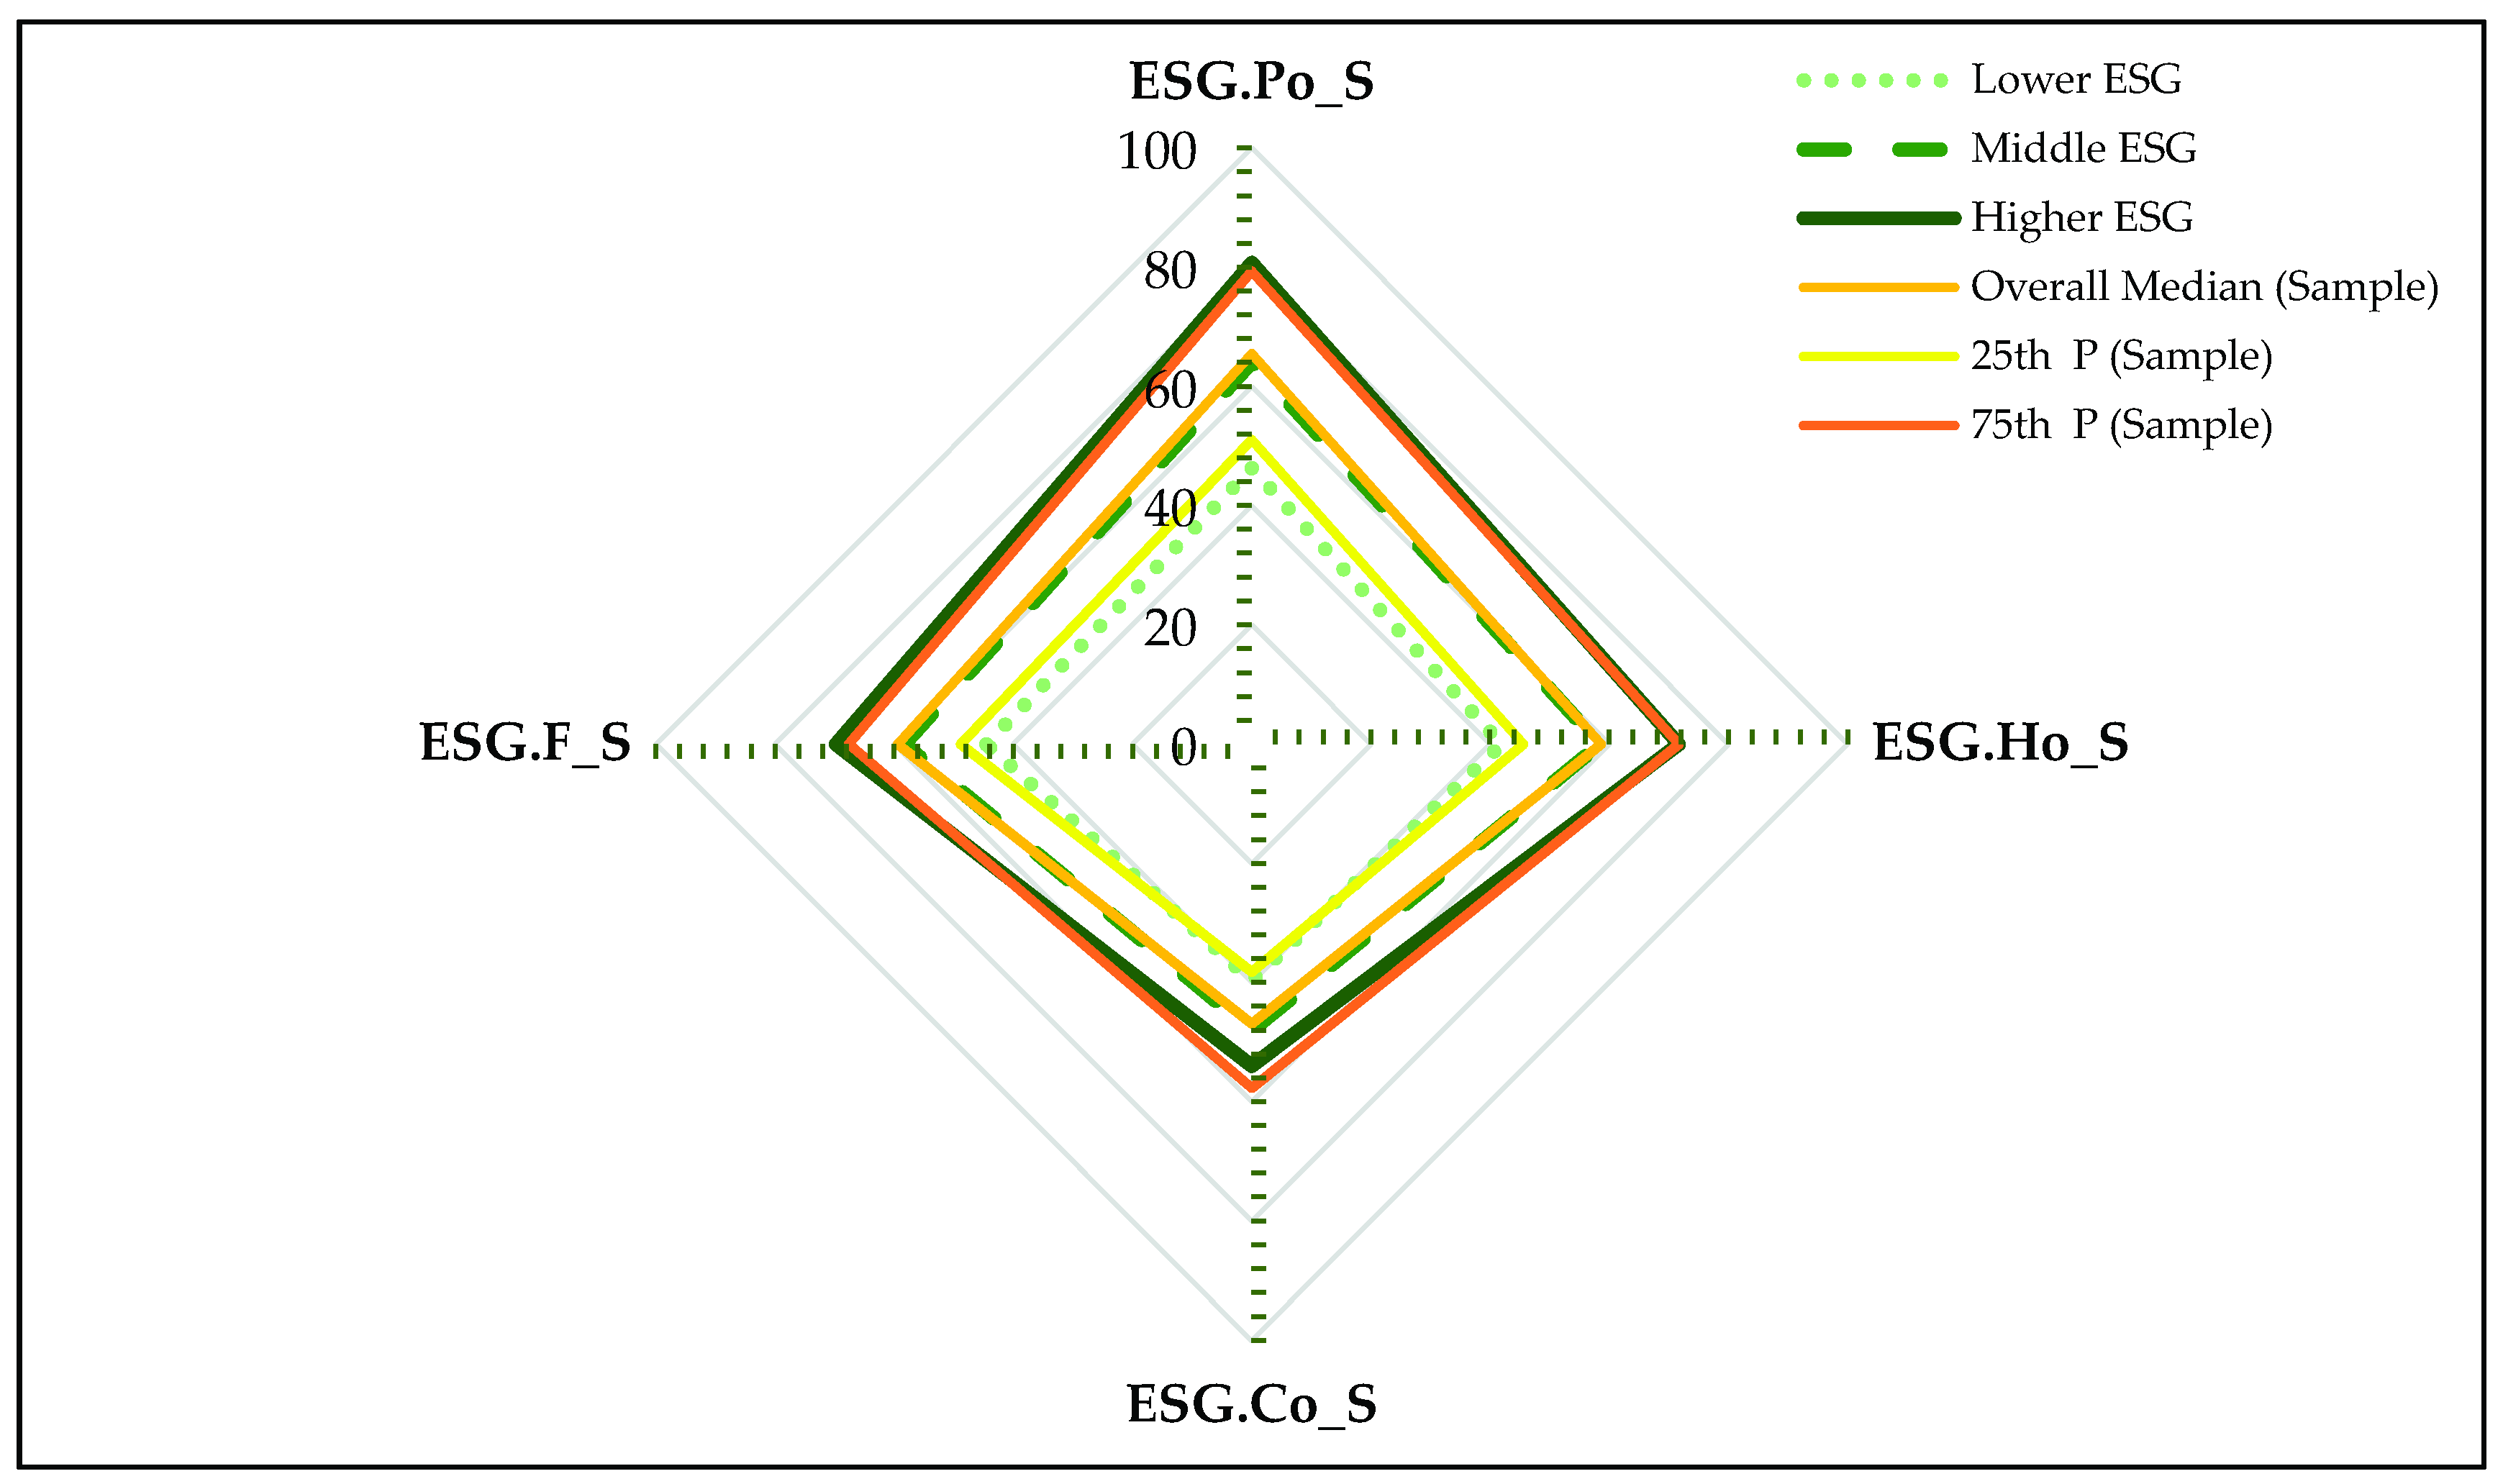 Cfa Level 1 Summary Notes Pdf Free